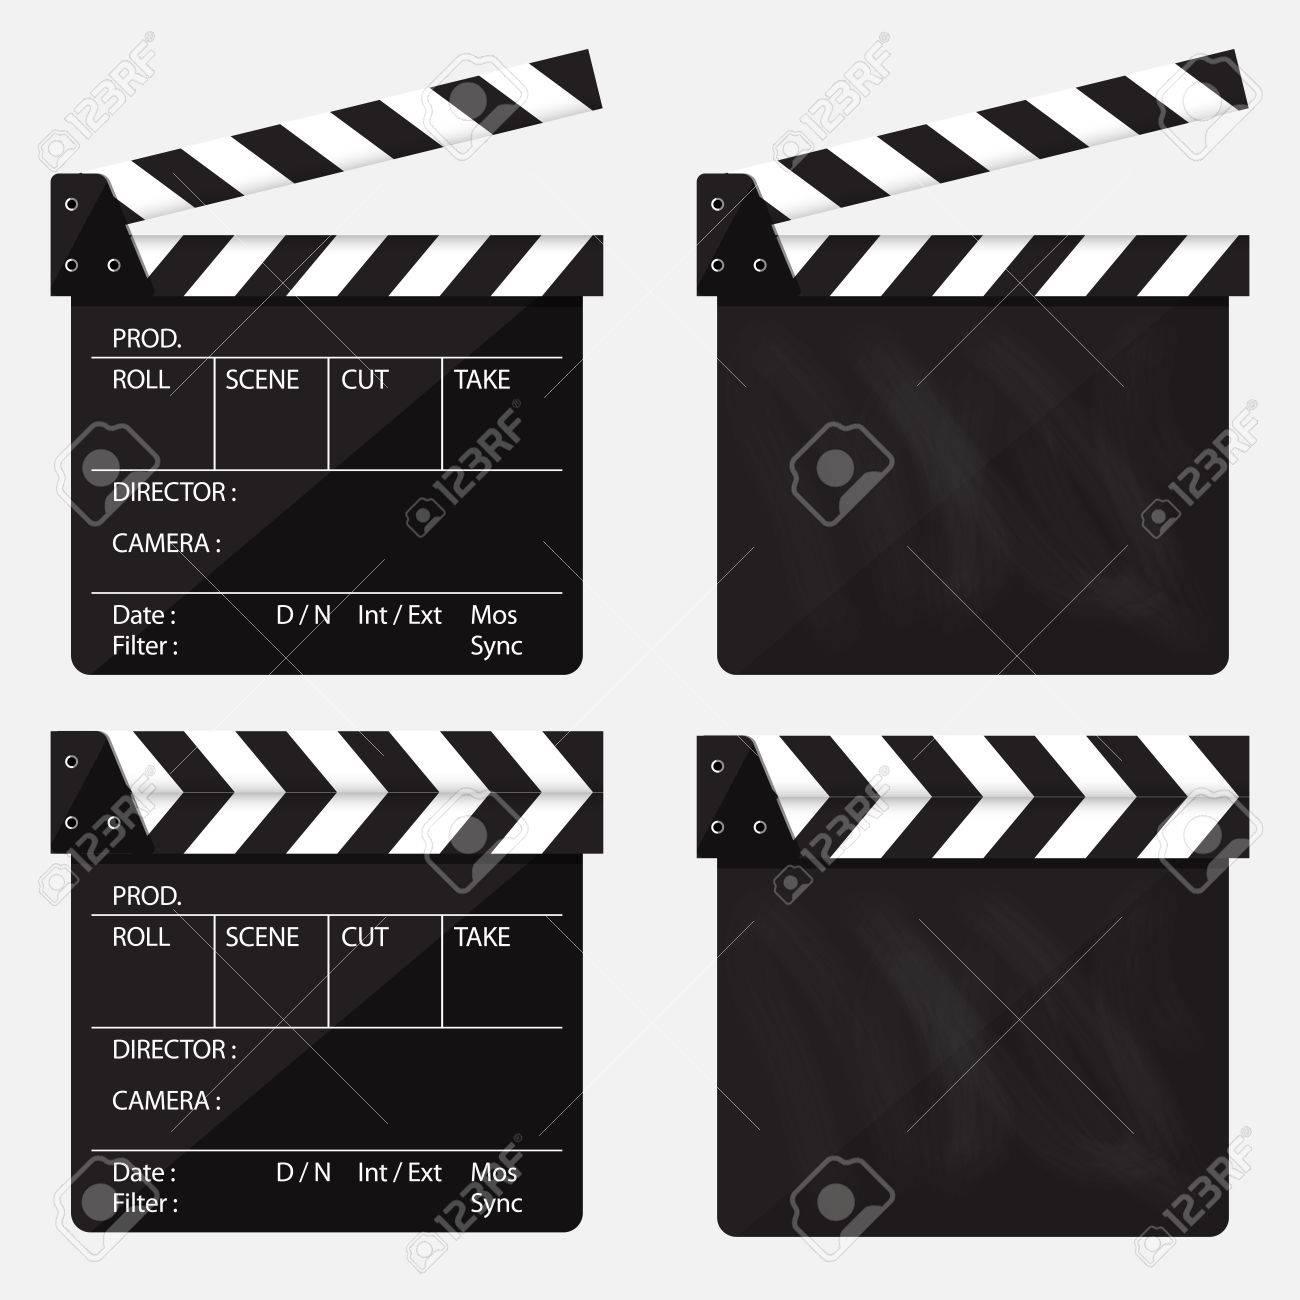 Set of movie clapperboard. Blank movie clapperboard. Vector Illustration - 44194493